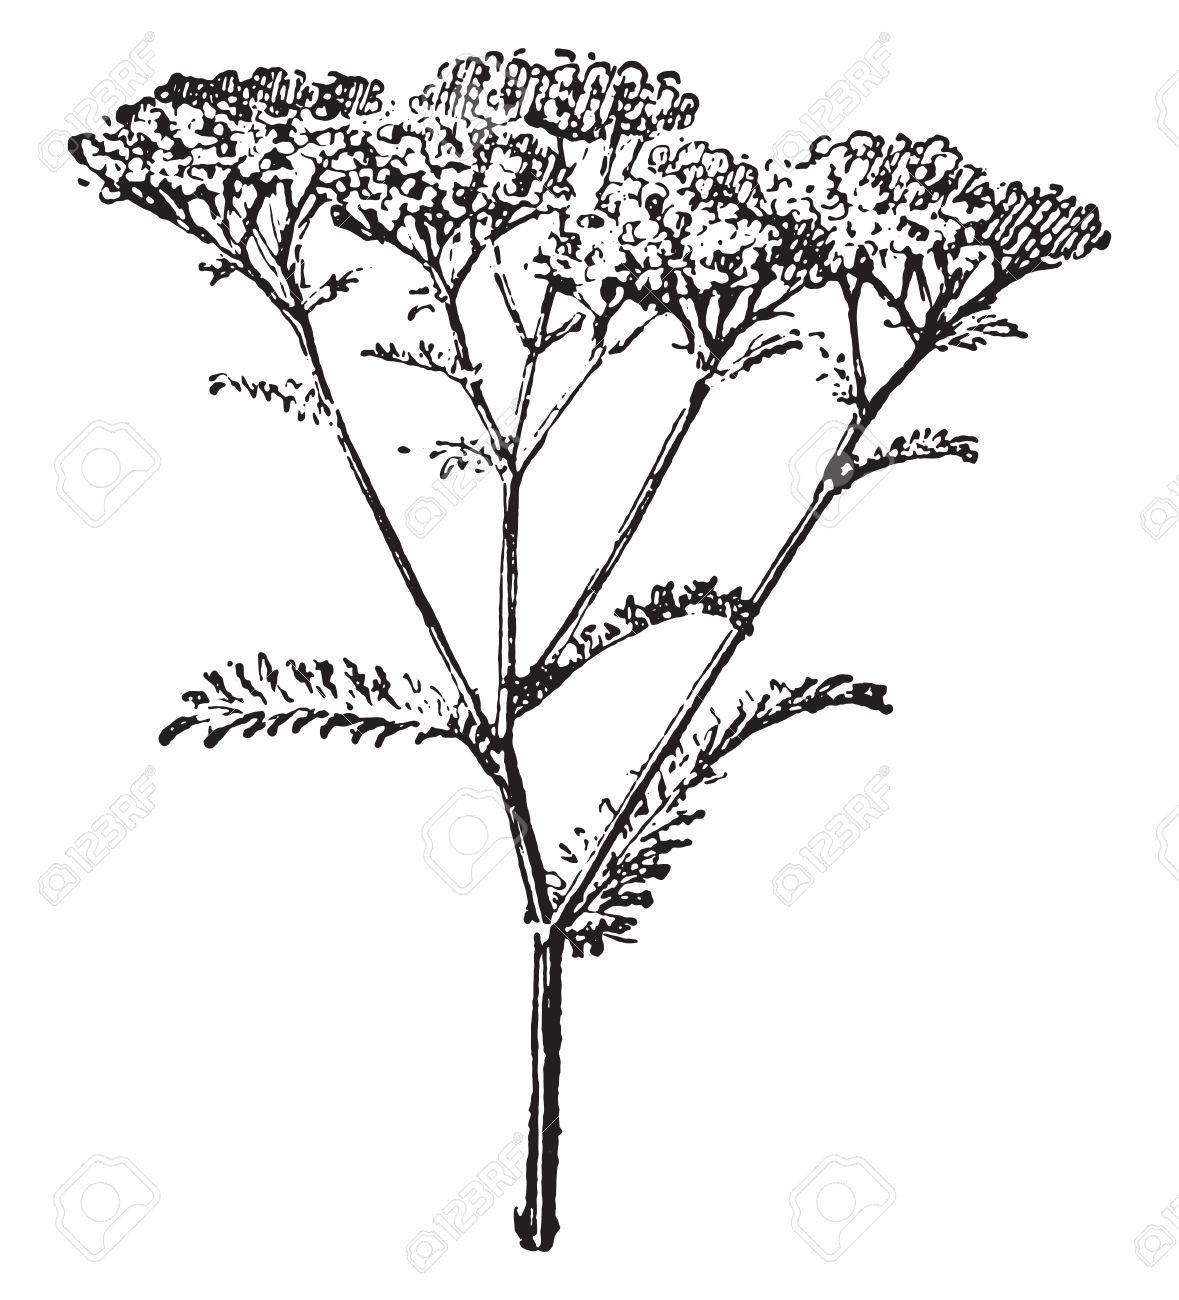 Yarrow Or Achillea Millefolium, Vintage Engraved Illustration.